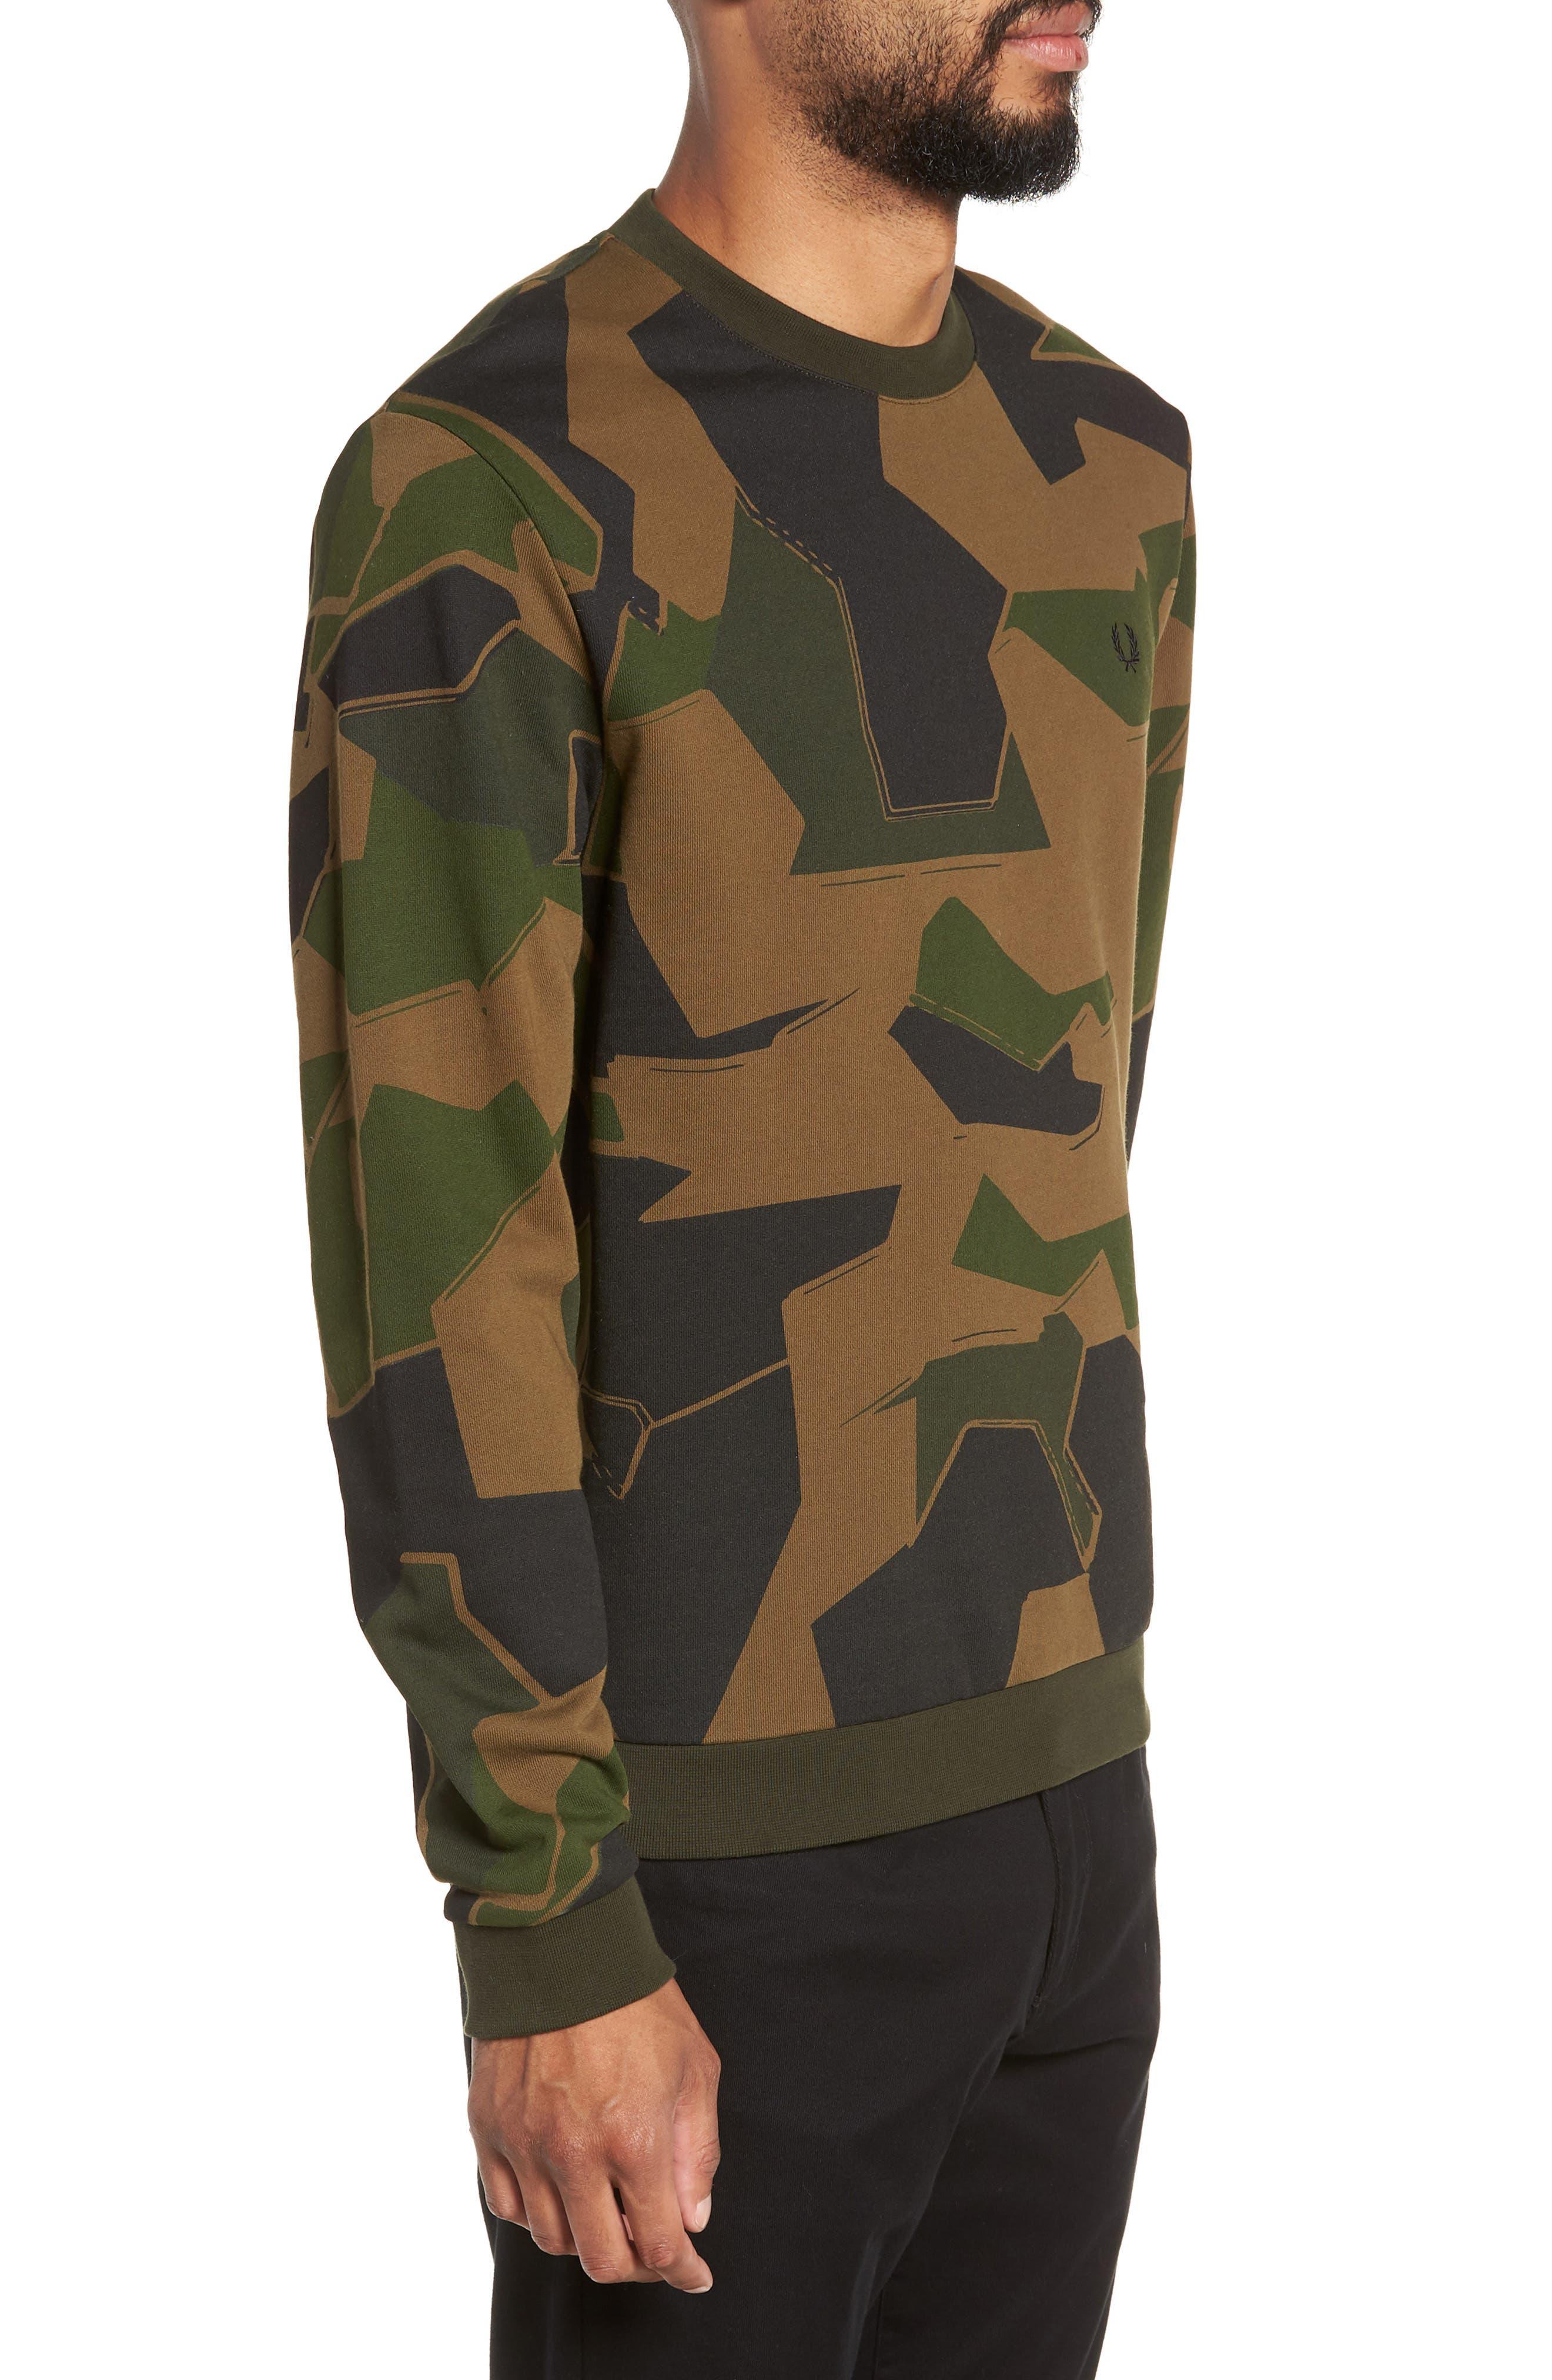 Camoflage Sweatshirt,                             Alternate thumbnail 3, color,                             WOODLAND CAMO